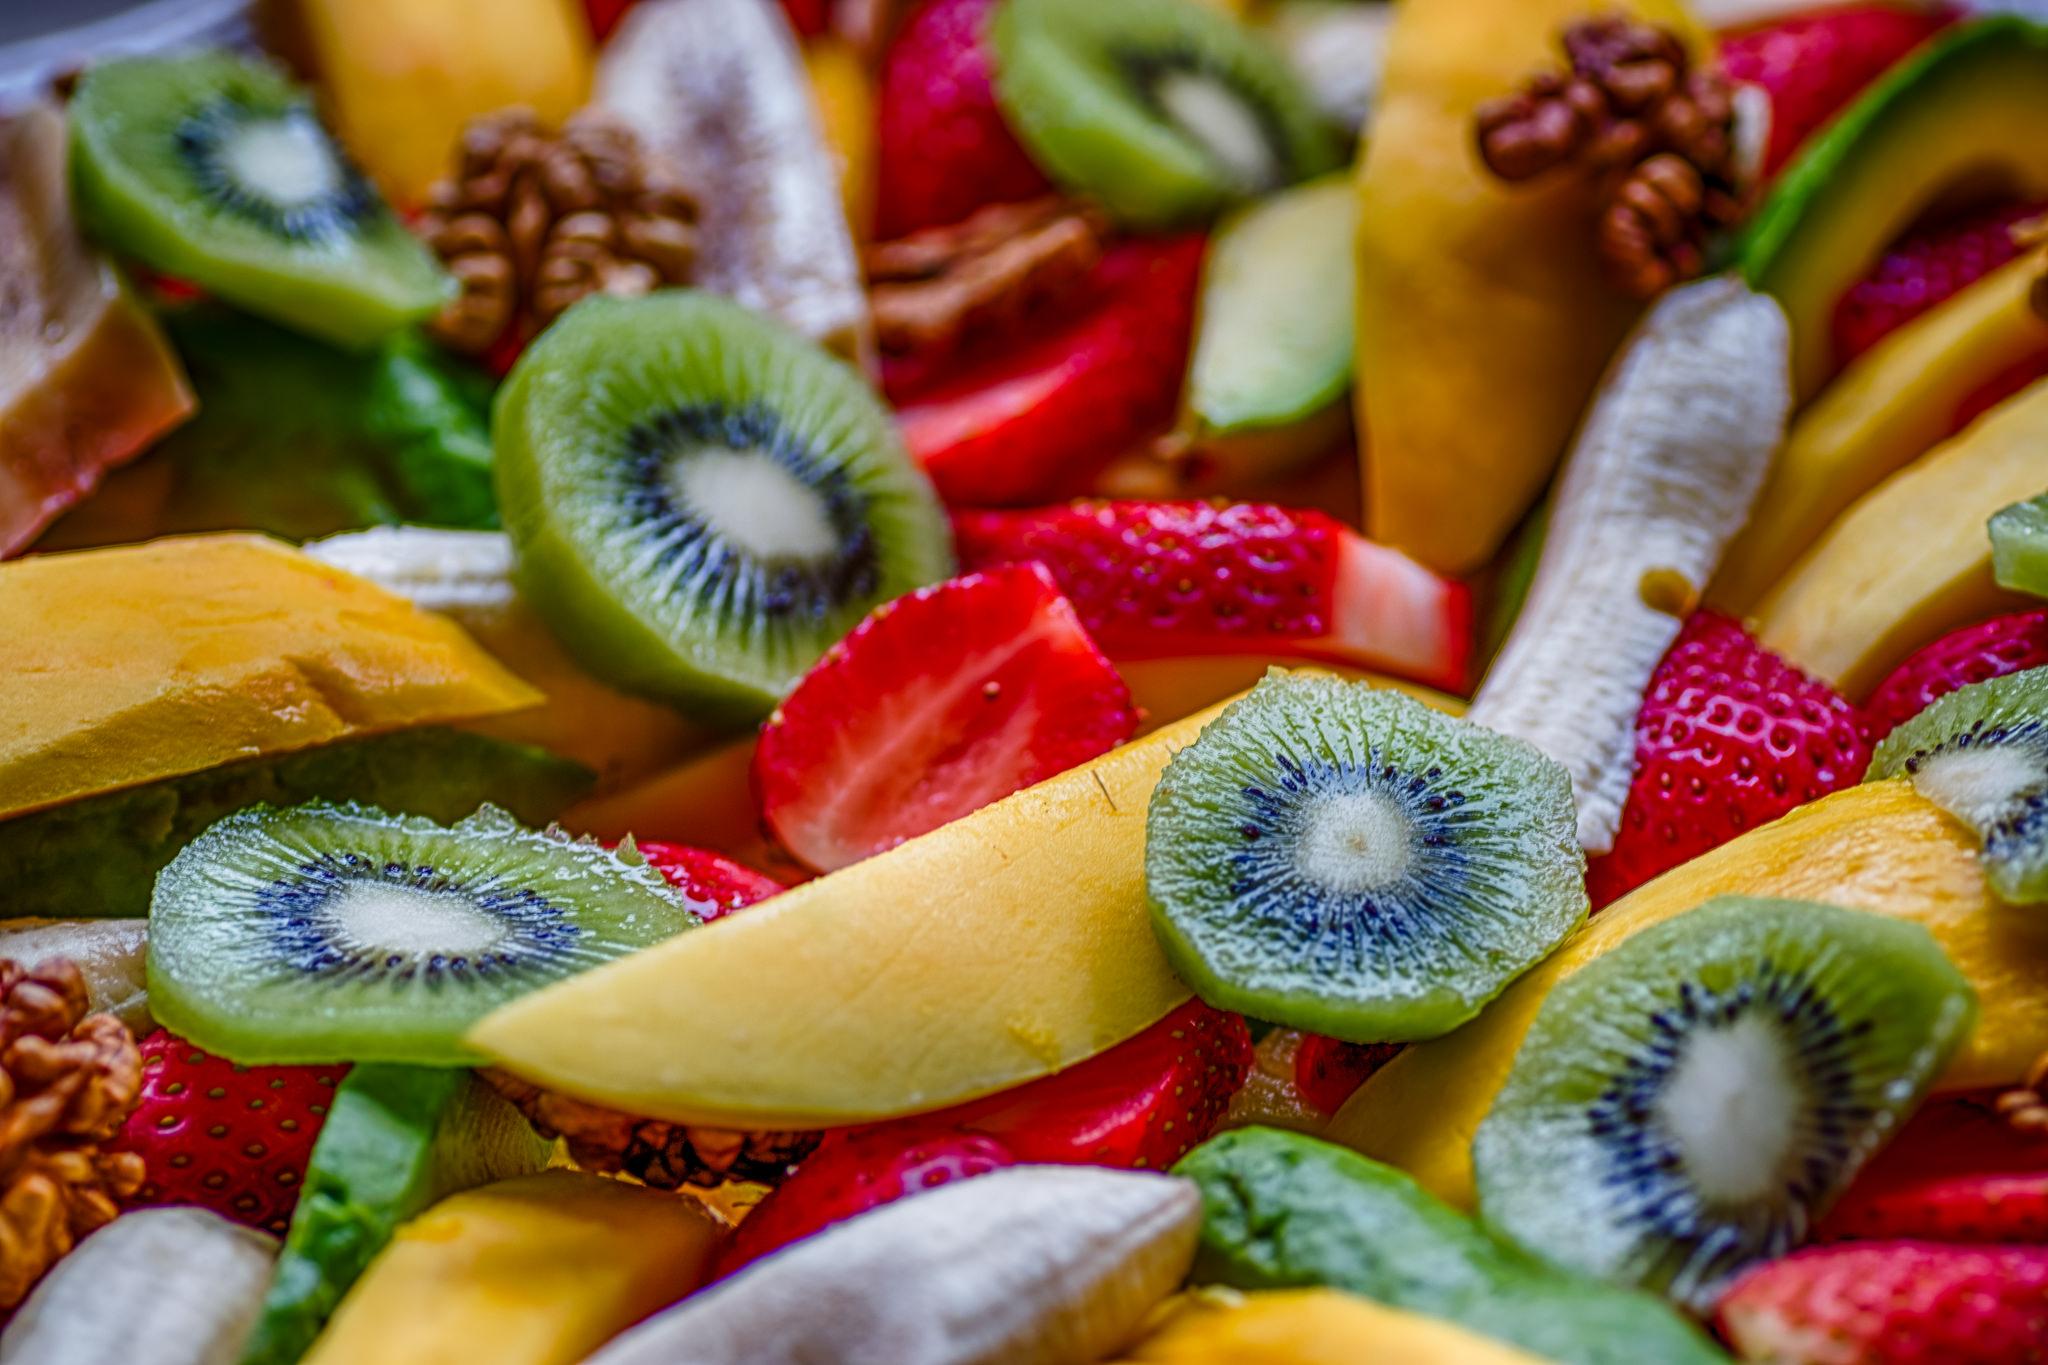 Frases Doação De Alimentos: Frases Que Te Motivan A Decir Soy Sano Y Mantenerte Saludable